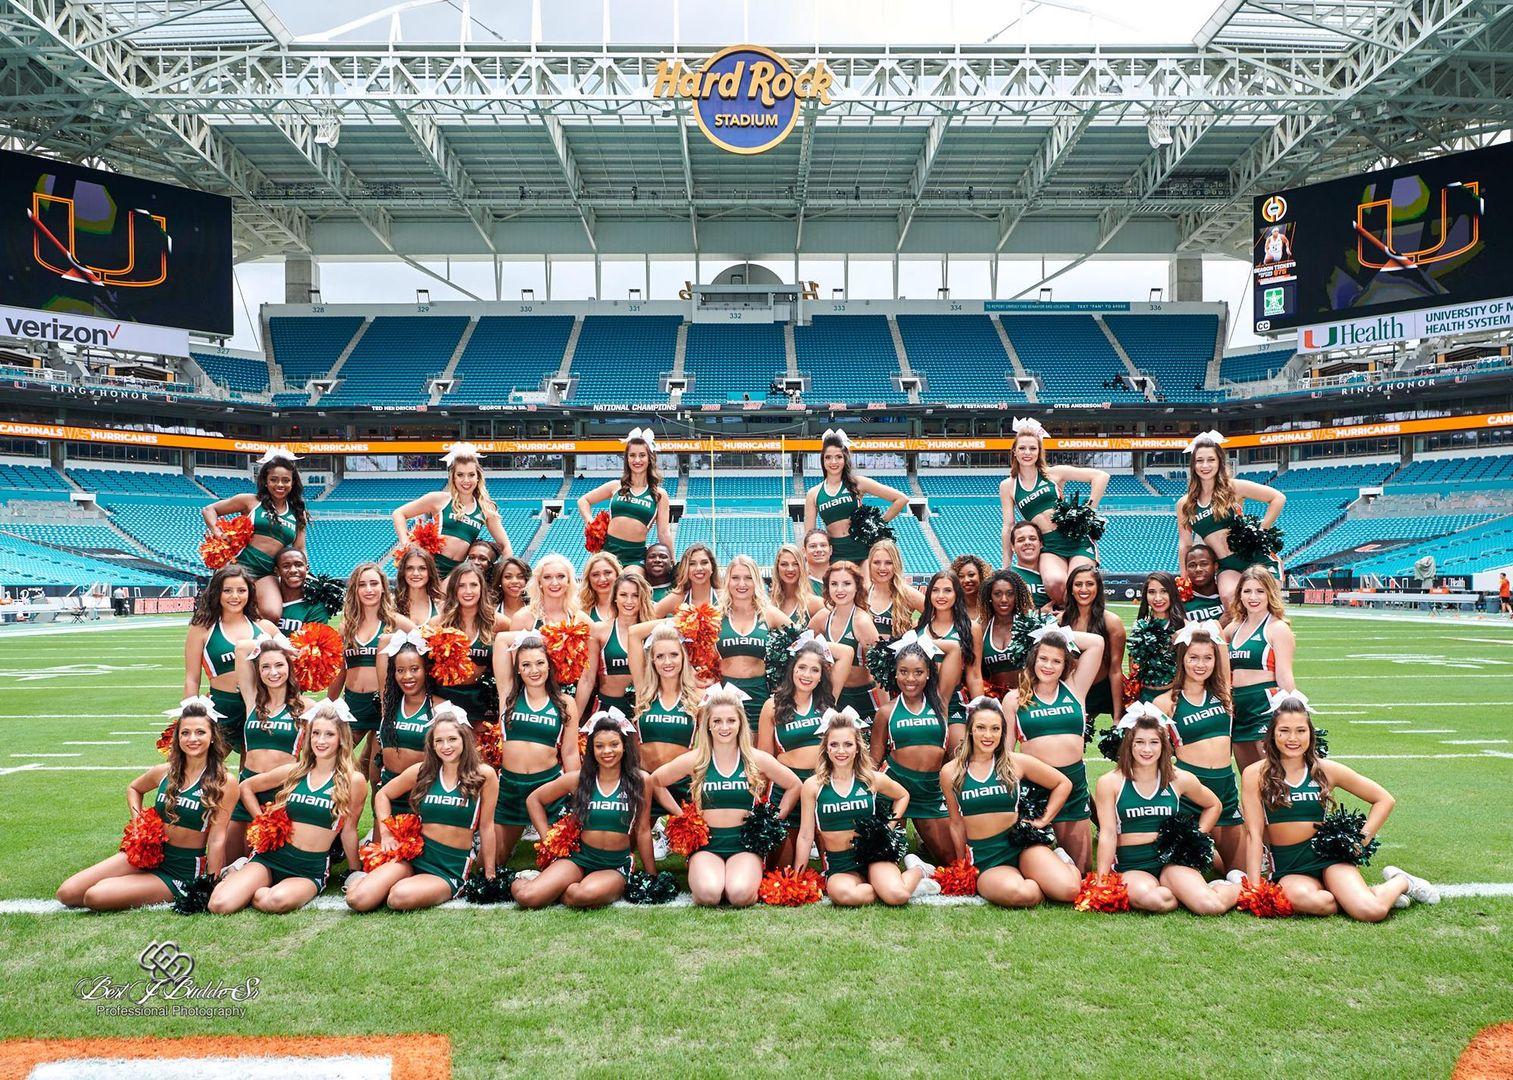 Cheerleaders and Sunsations Dance Team